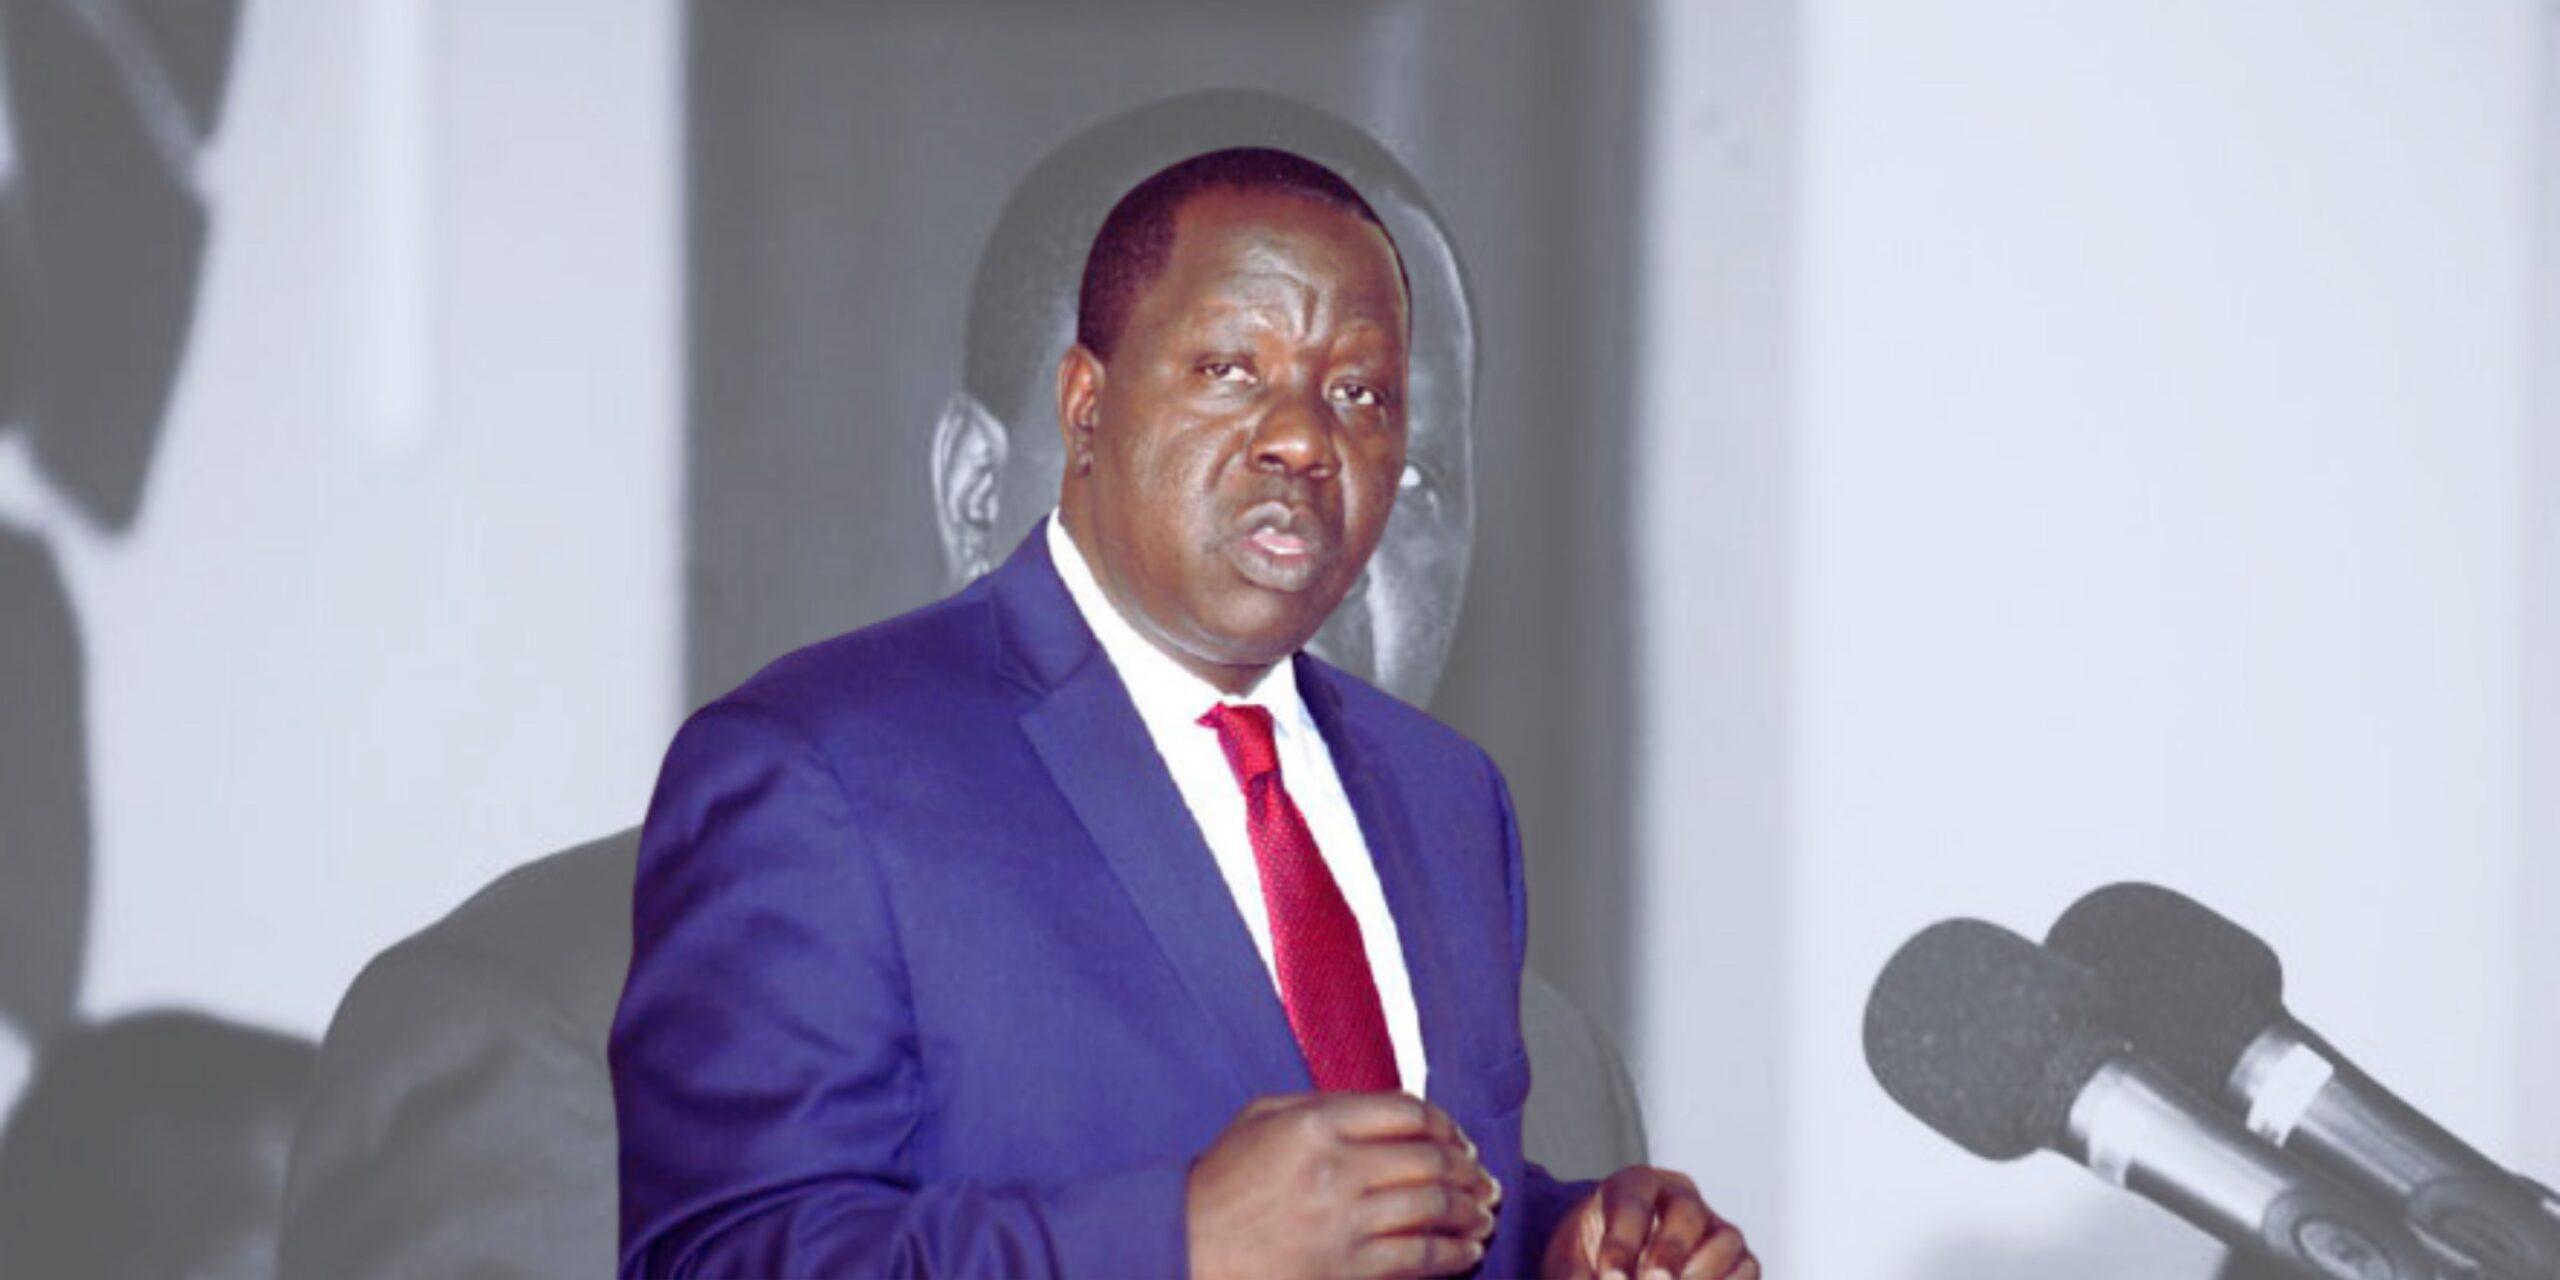 MP Arama takes a stand against Matiangi impeachment plan